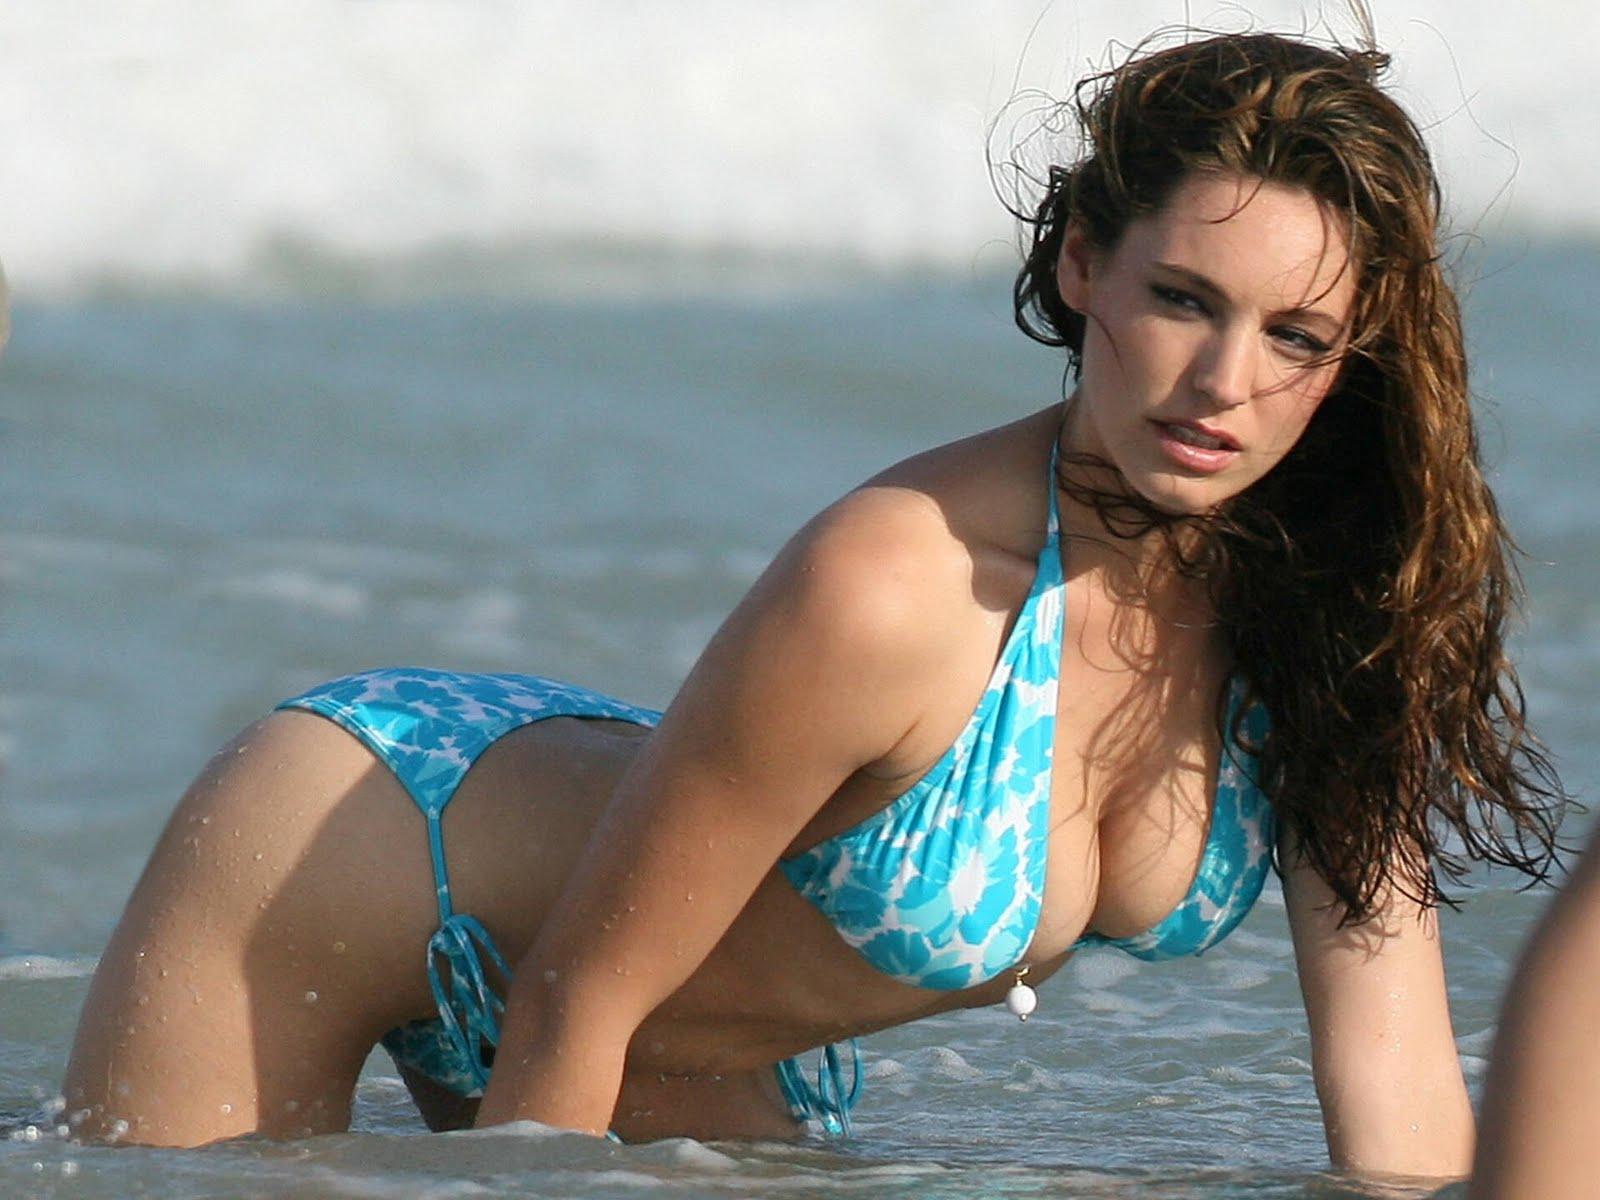 Boobs Tits Melissa Moore (actress)  nude (54 photos), iCloud, cameltoe